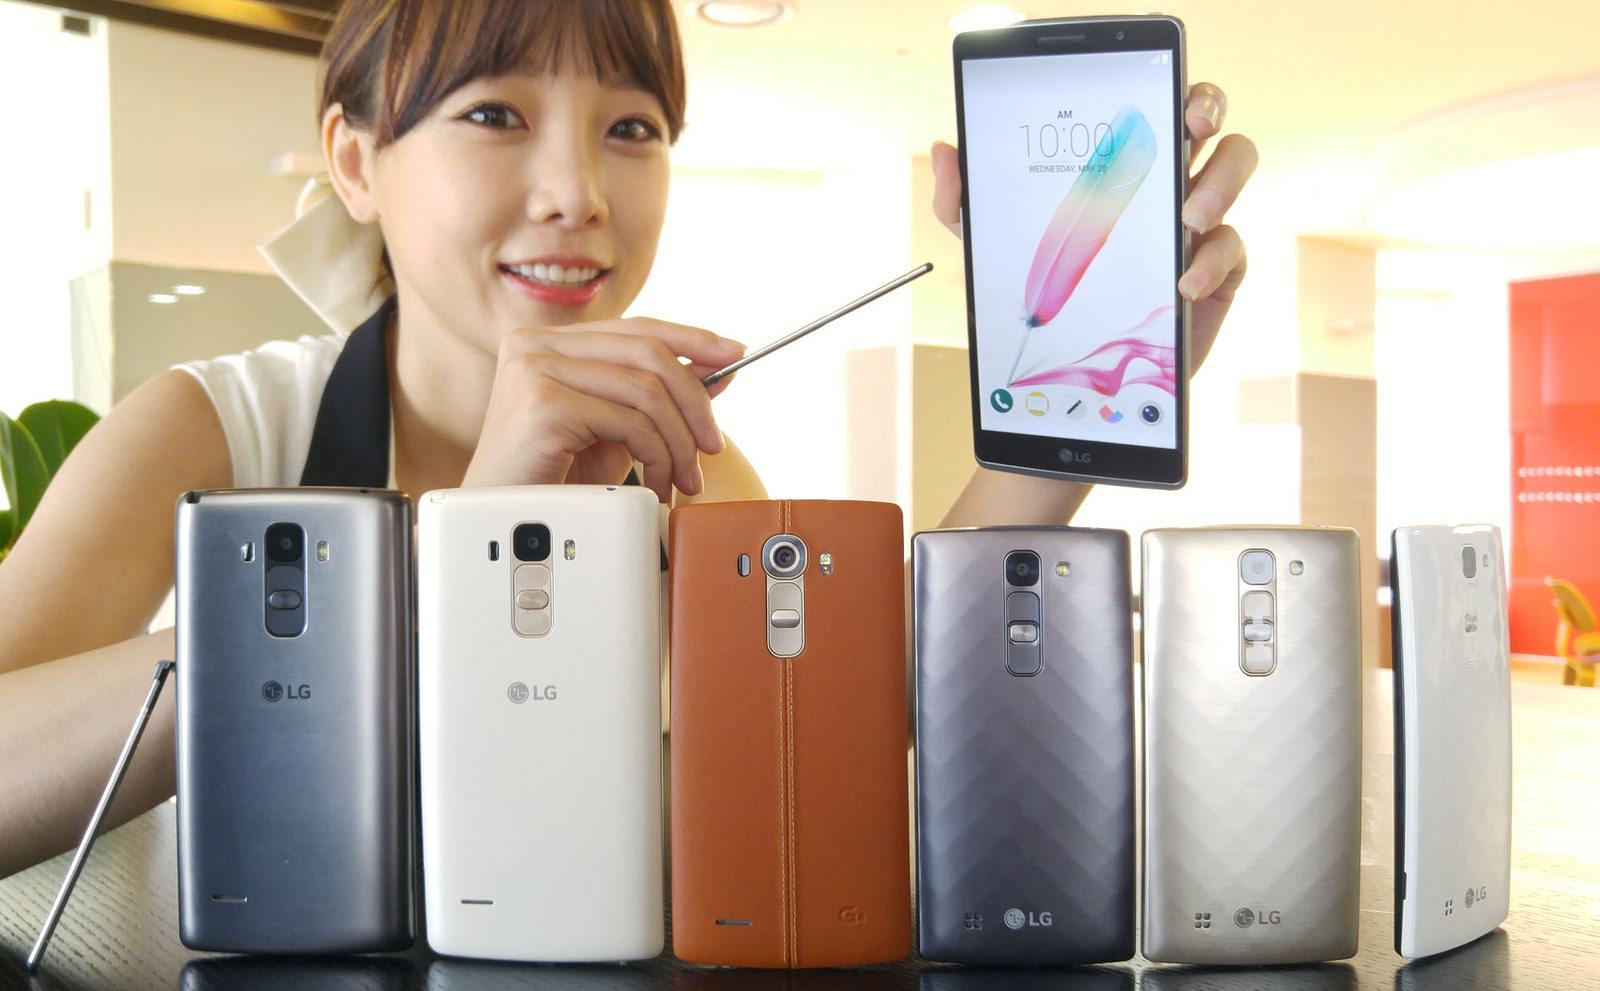 LG-G4-Stylus-LG-G4-LG-G4c..jpg